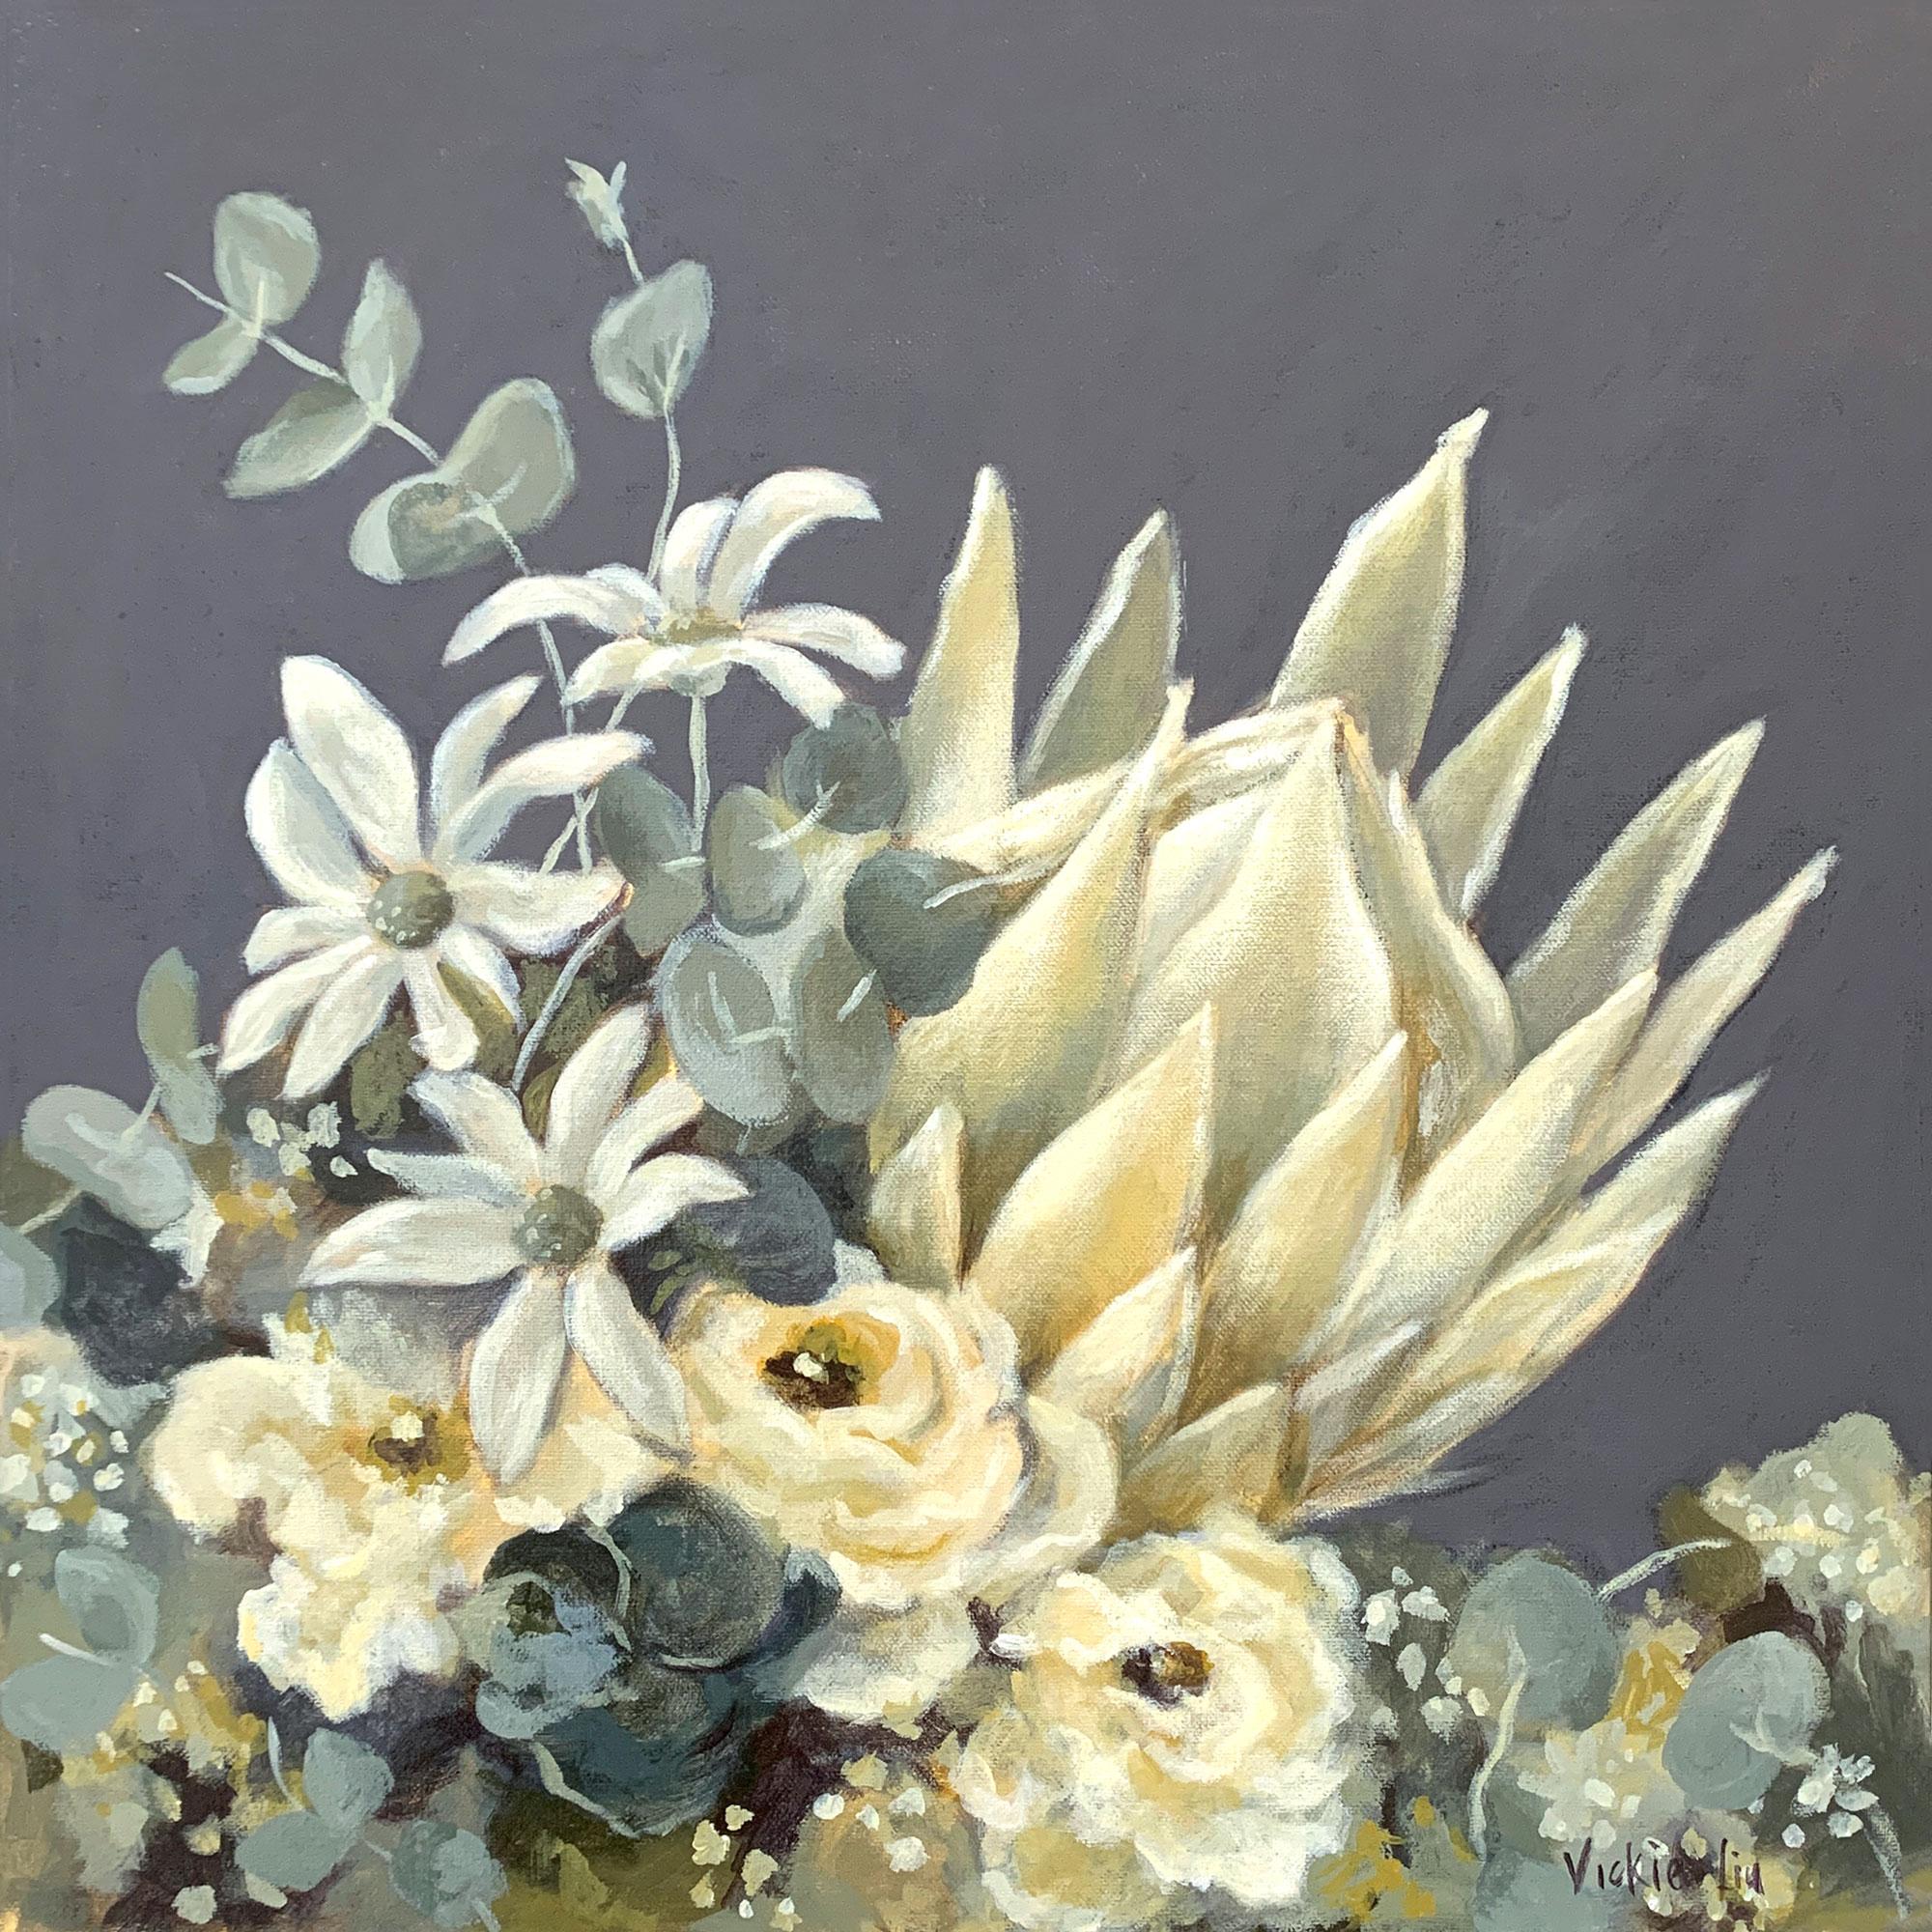 Vickie Liu White King Protea 45×45